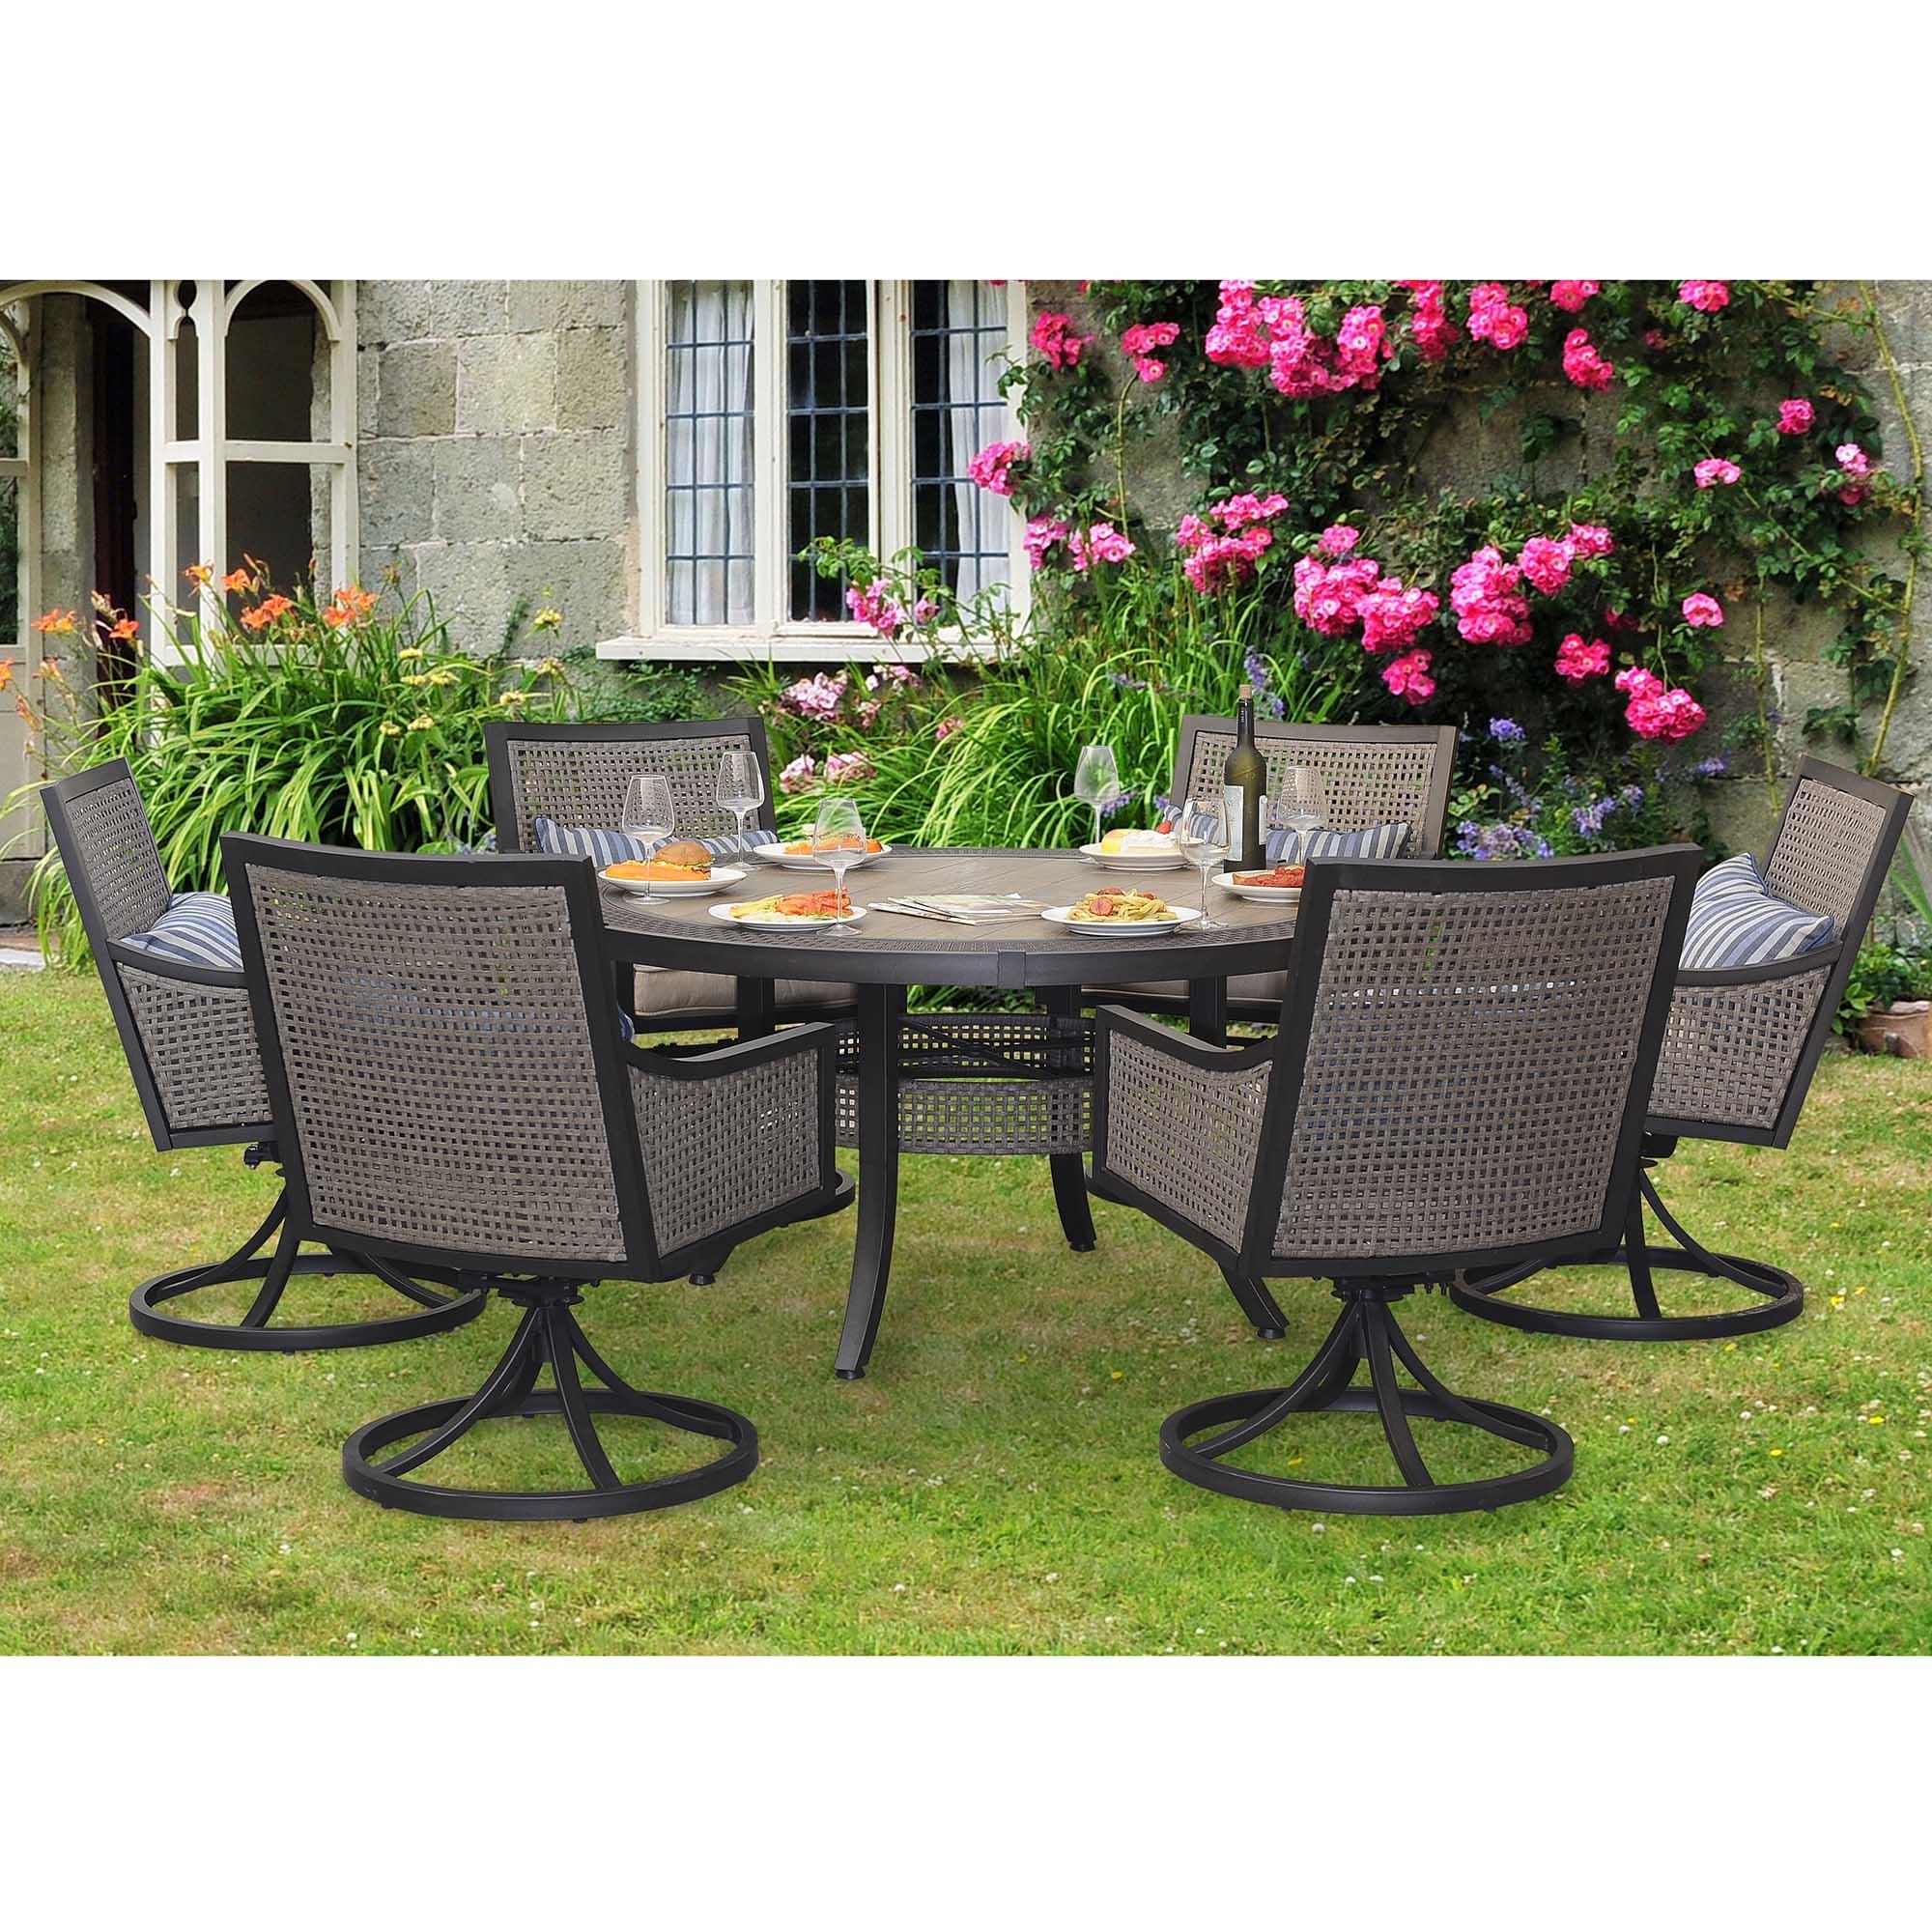 sears patio furniture dining sets Sunjoy 7-Piece Myna Patio Dining Set